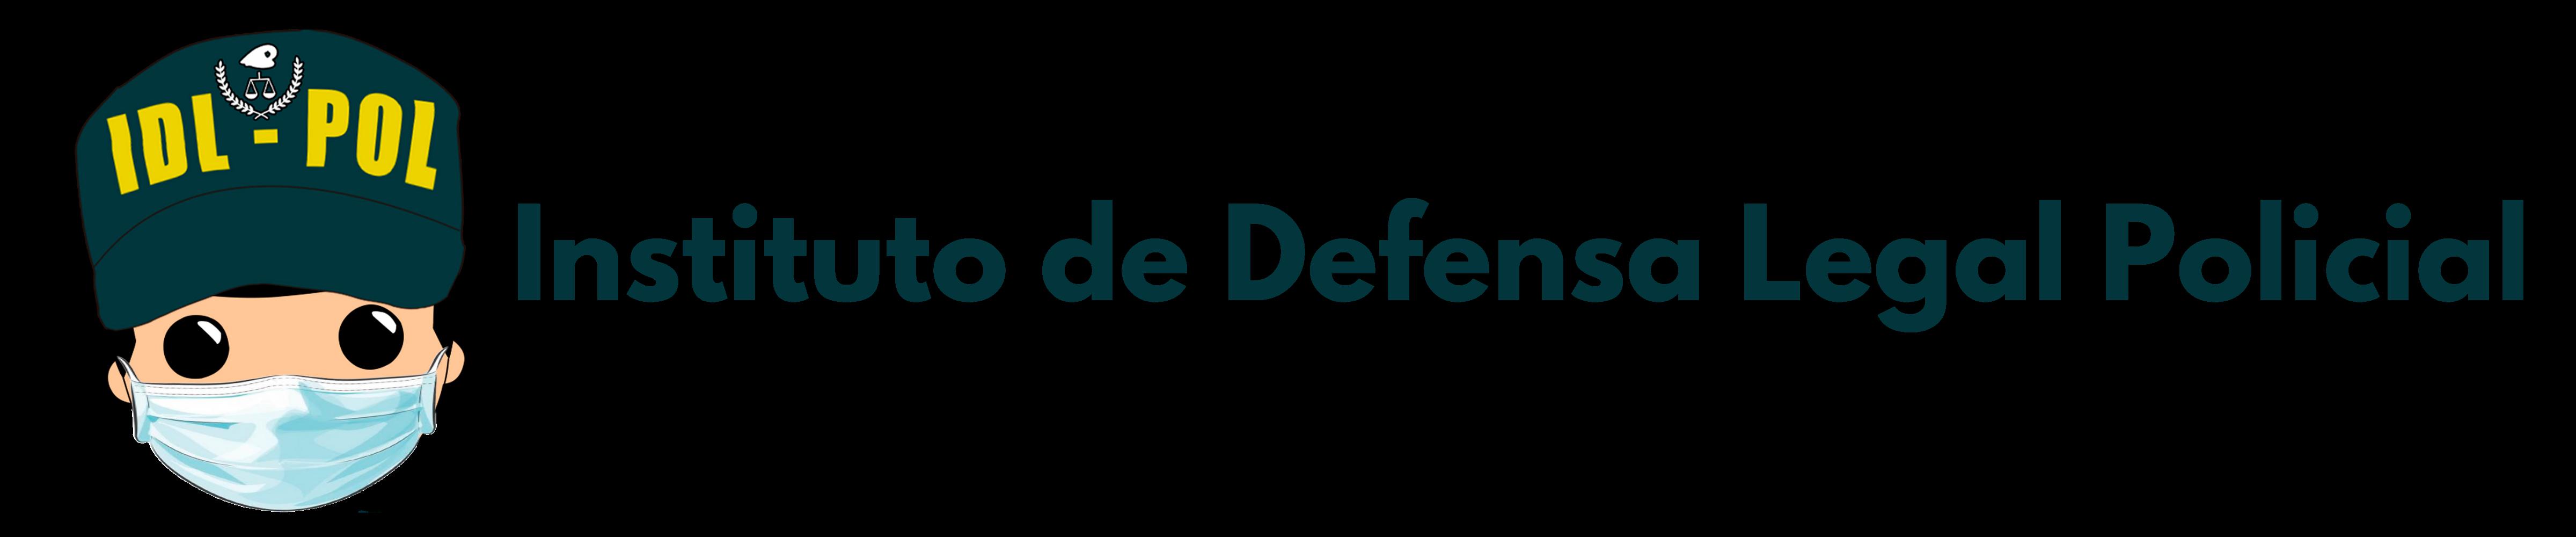 Instituto de Defensa Legal Policial